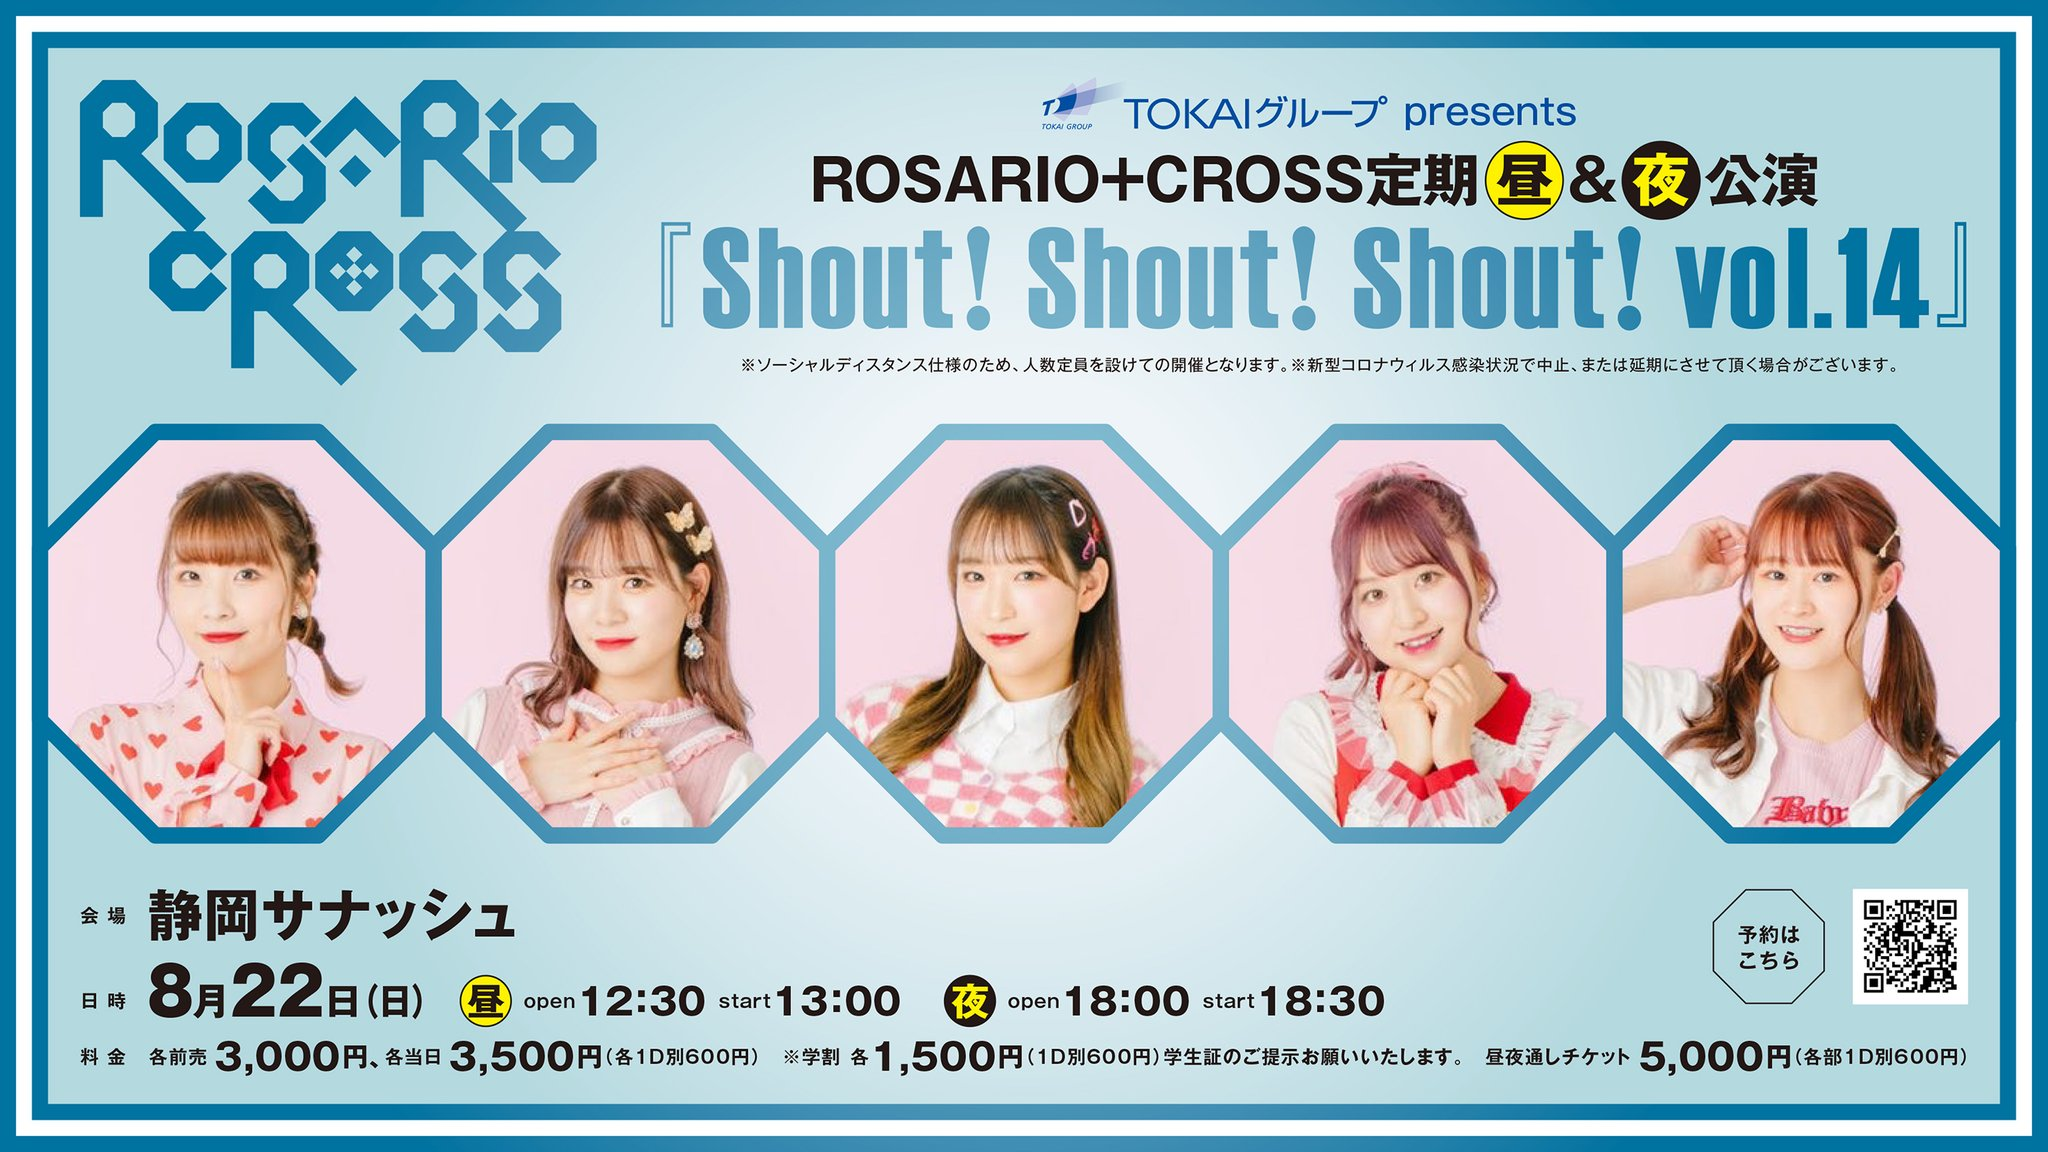 TOKAIグループ Presents  ROSARIO+CROSS定期公演   「Shout! Shout! Shout! vol.14」《昼》《夜》